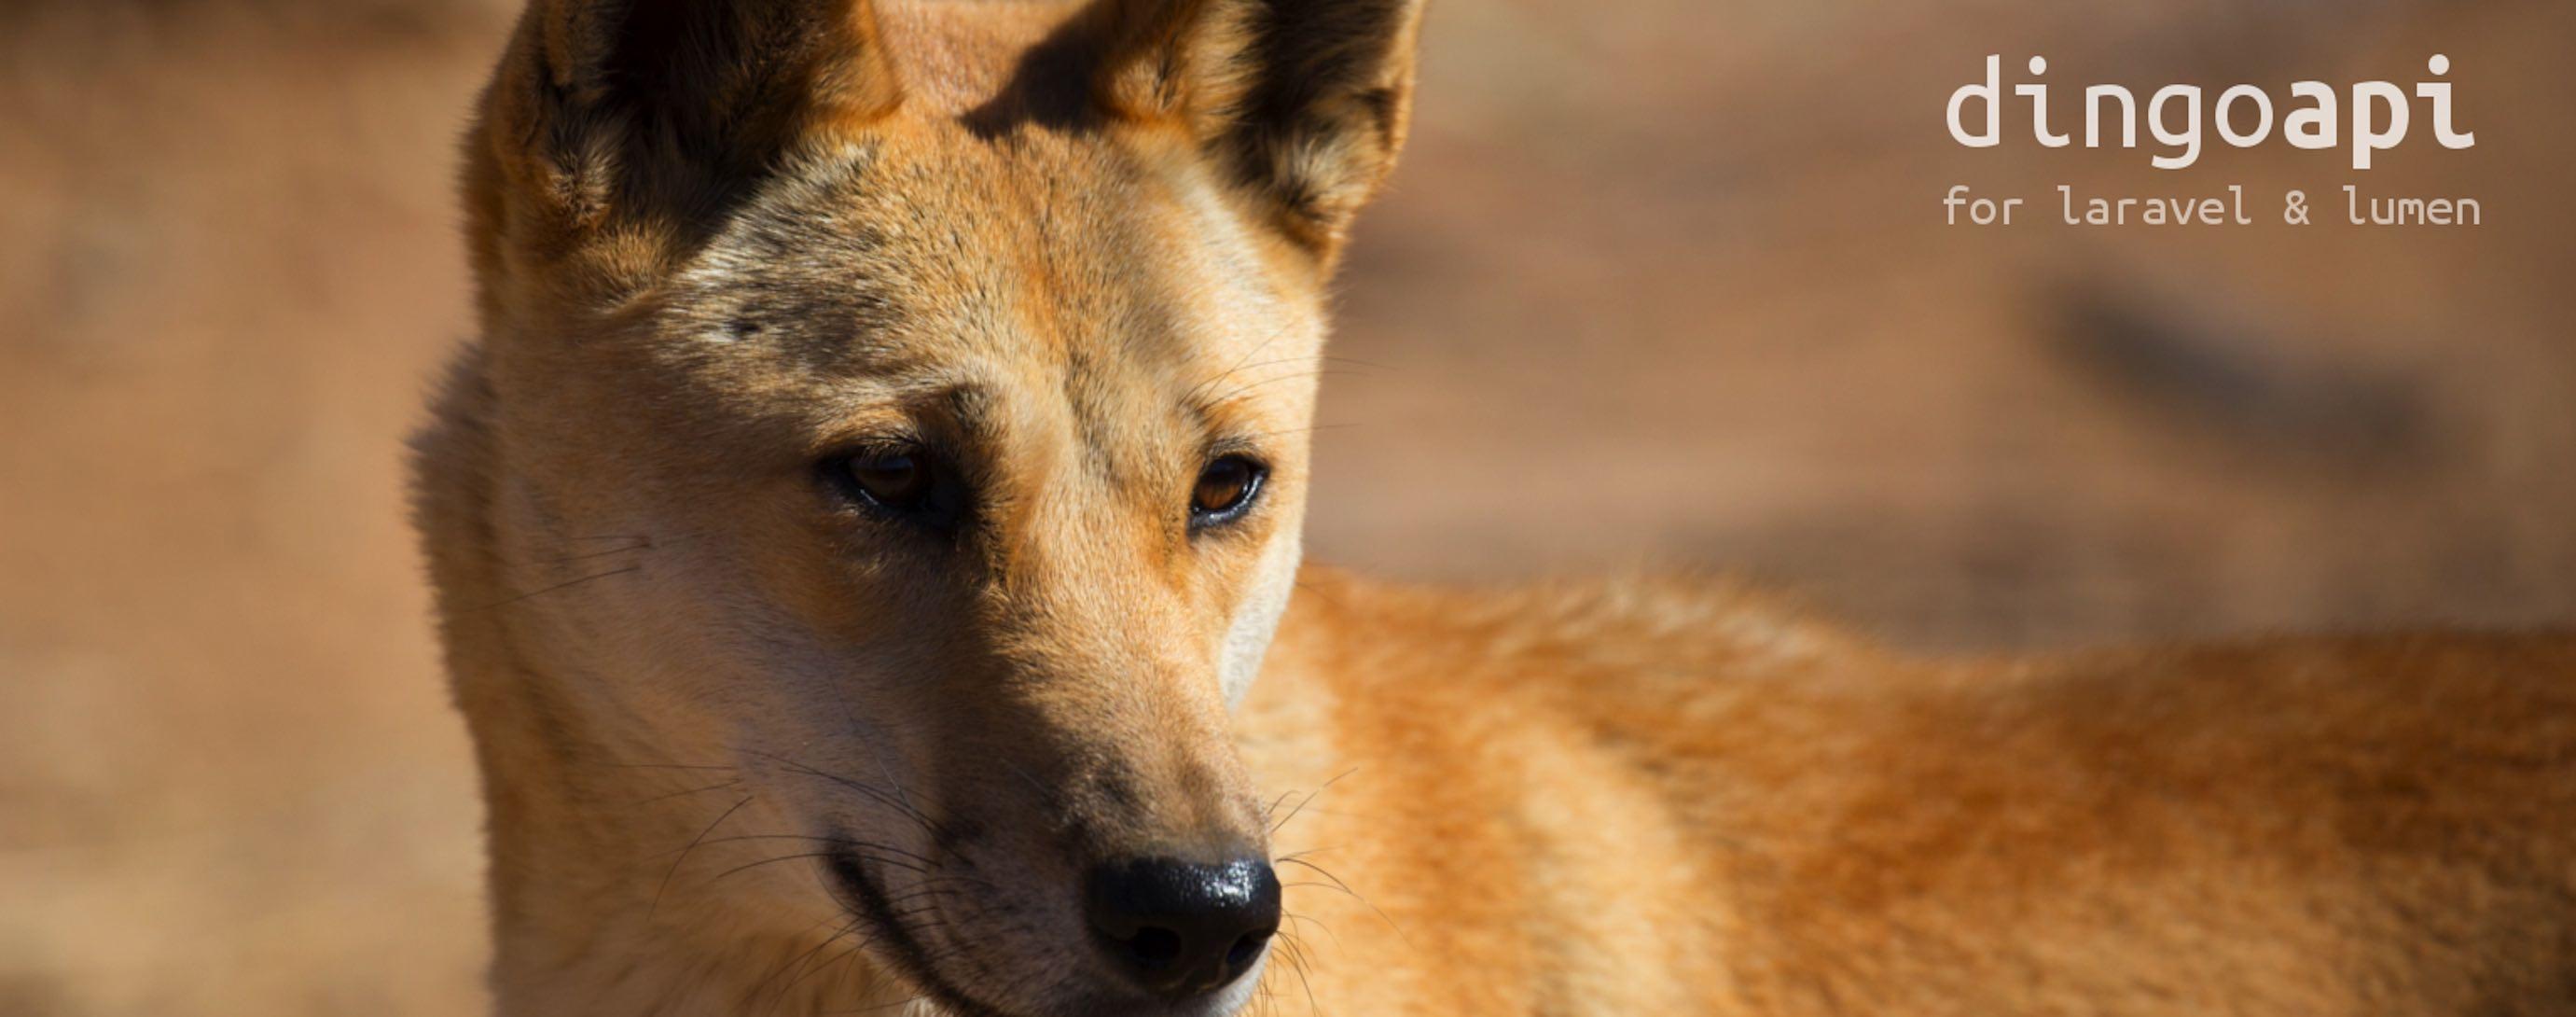 Laravel Dingo  API